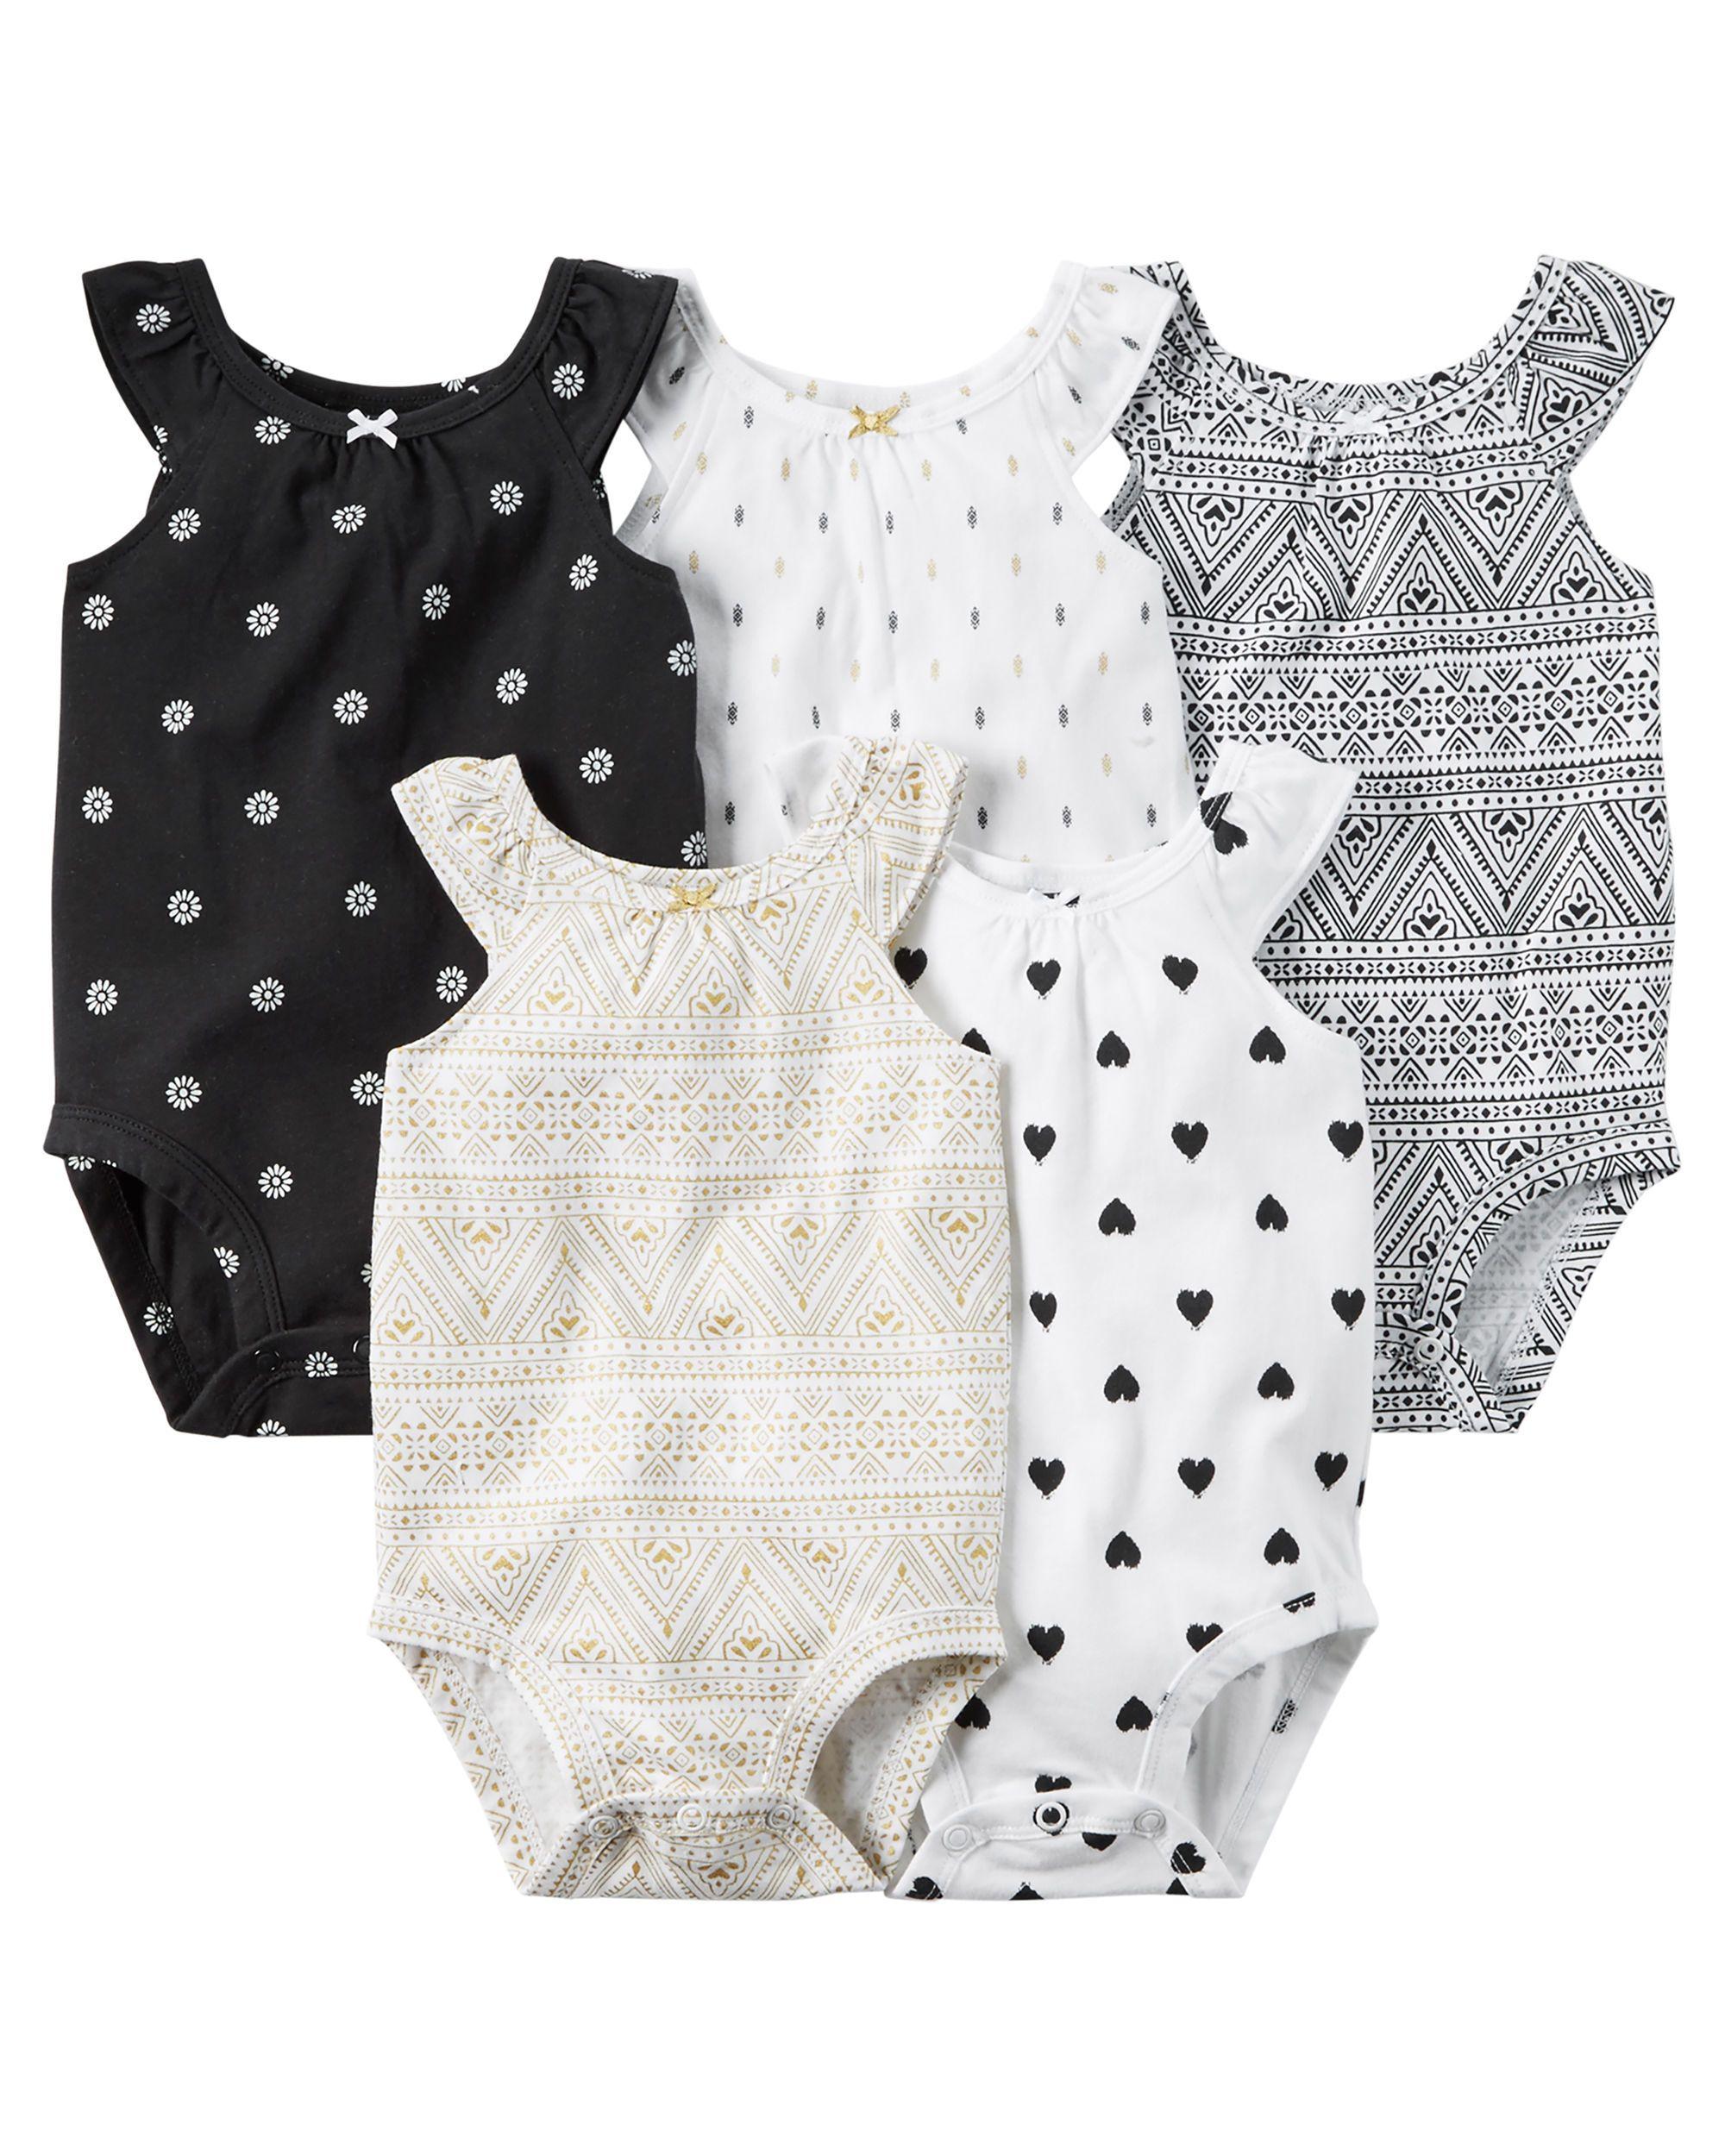 d3016918d890 5-Pack Sleeveless Bodysuits